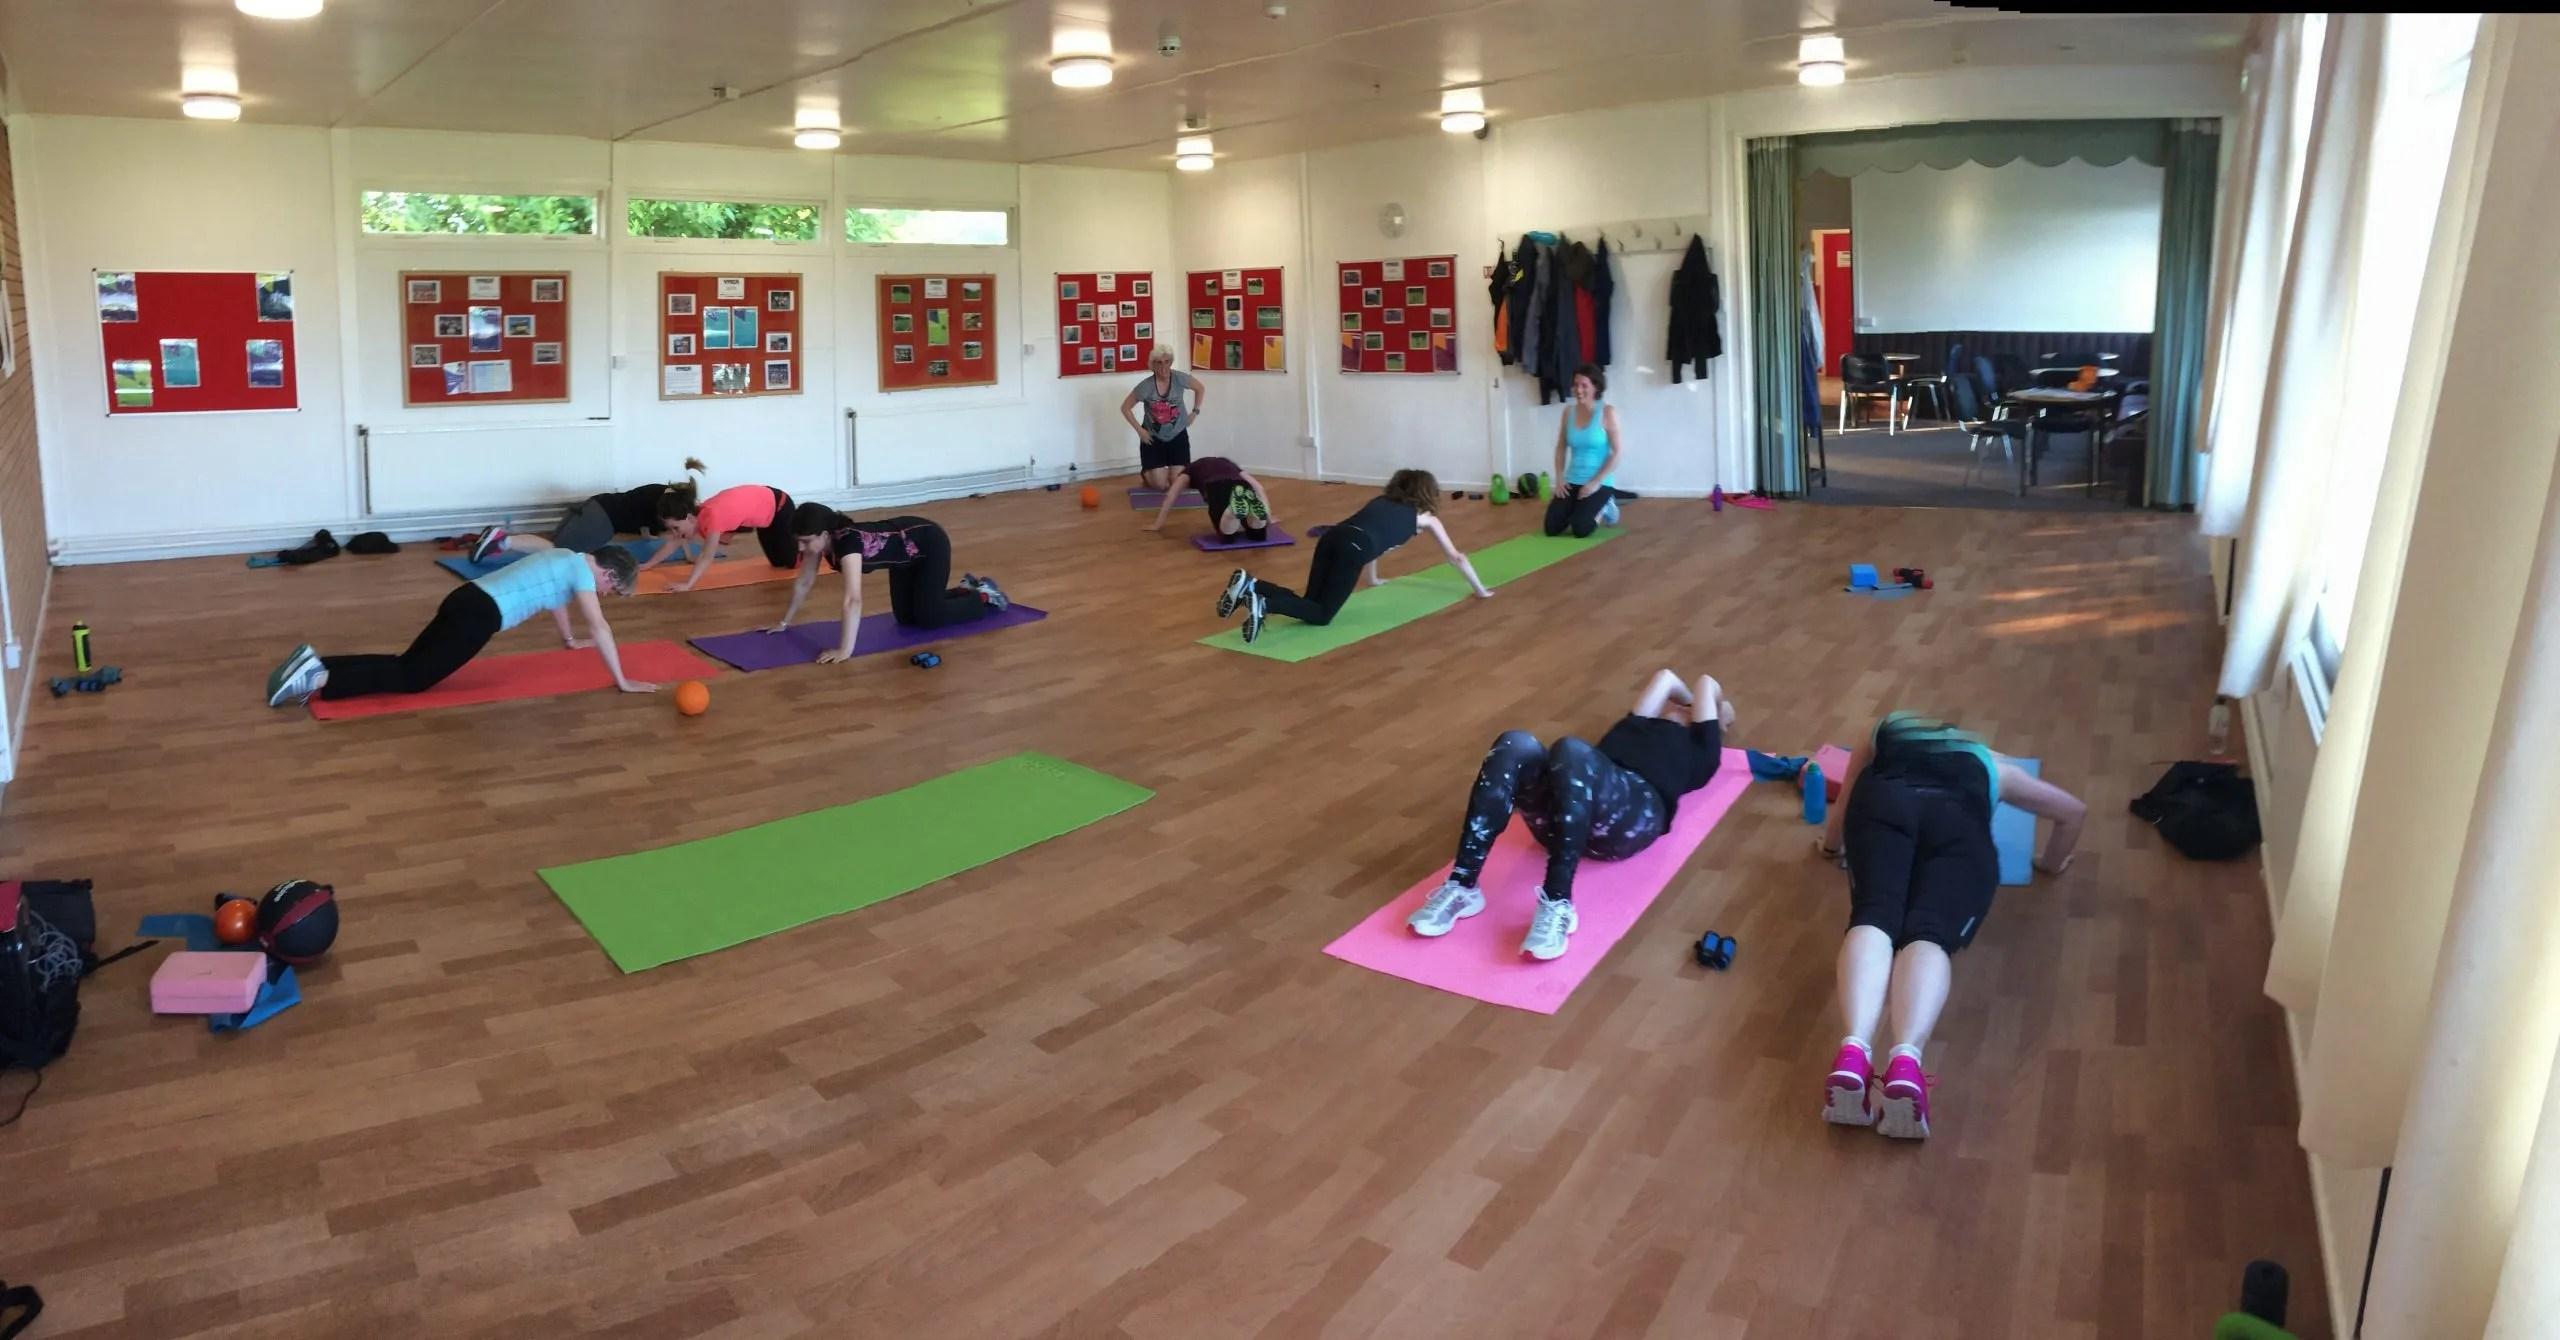 Exercise class in Leeds